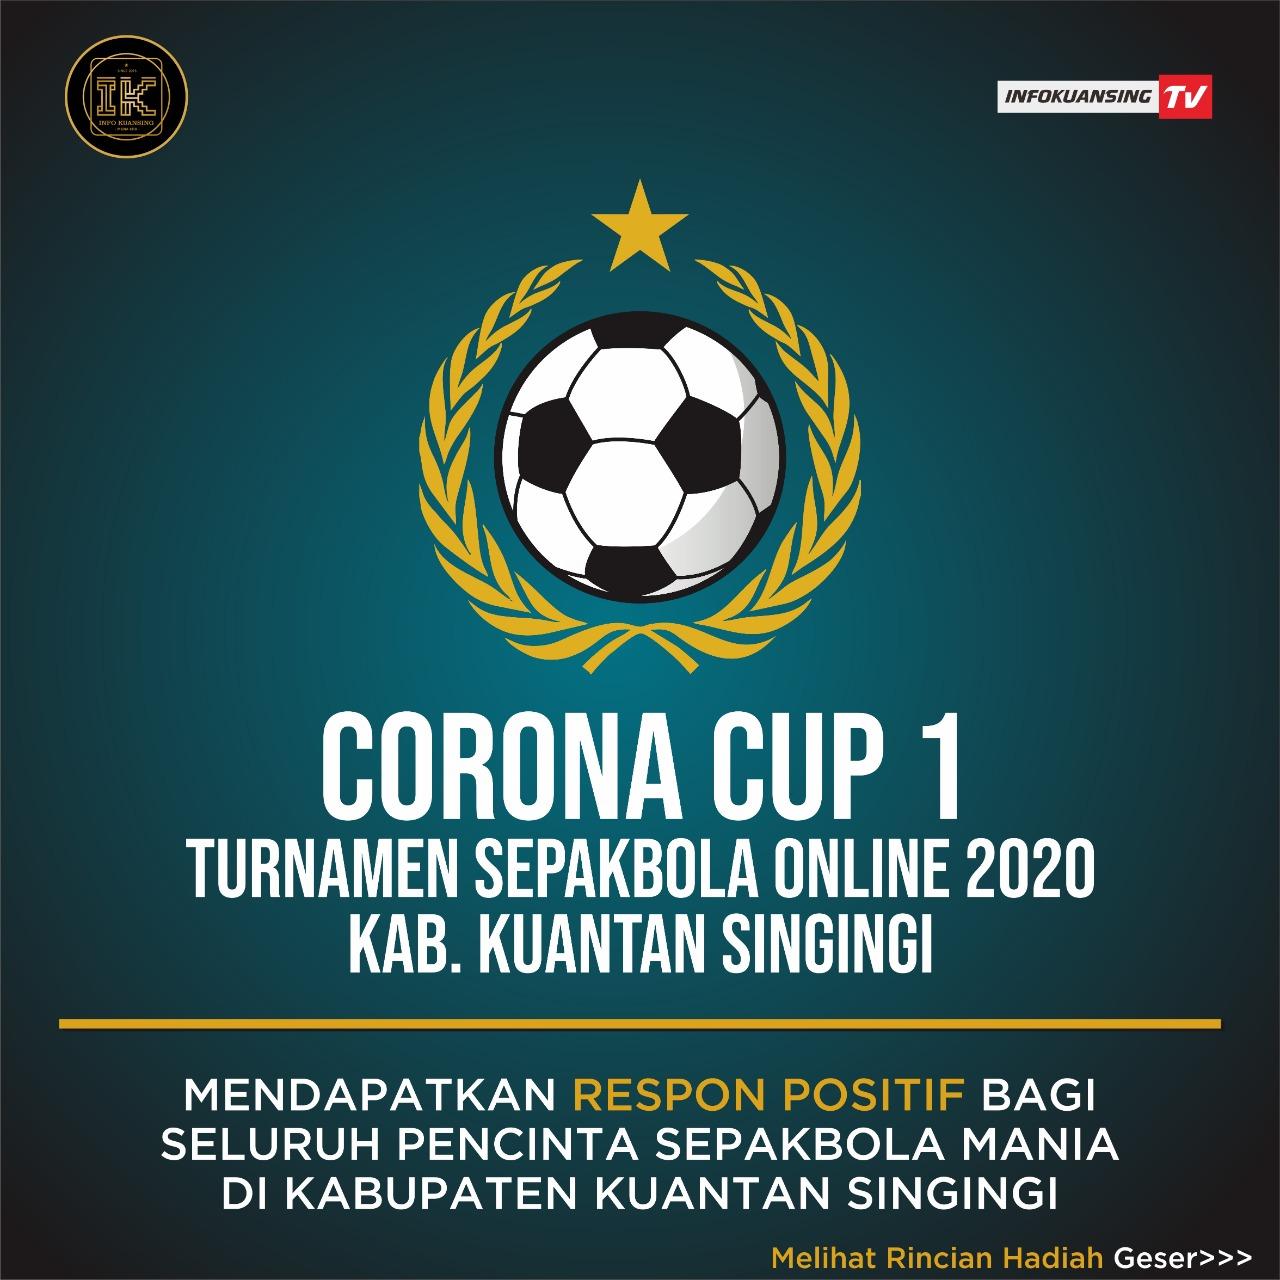 Pelaksanaan Turnamen Sepak Bola Online Infokuansing Tv Mendapatkan Apresiasi Dari Berbagai Pihak